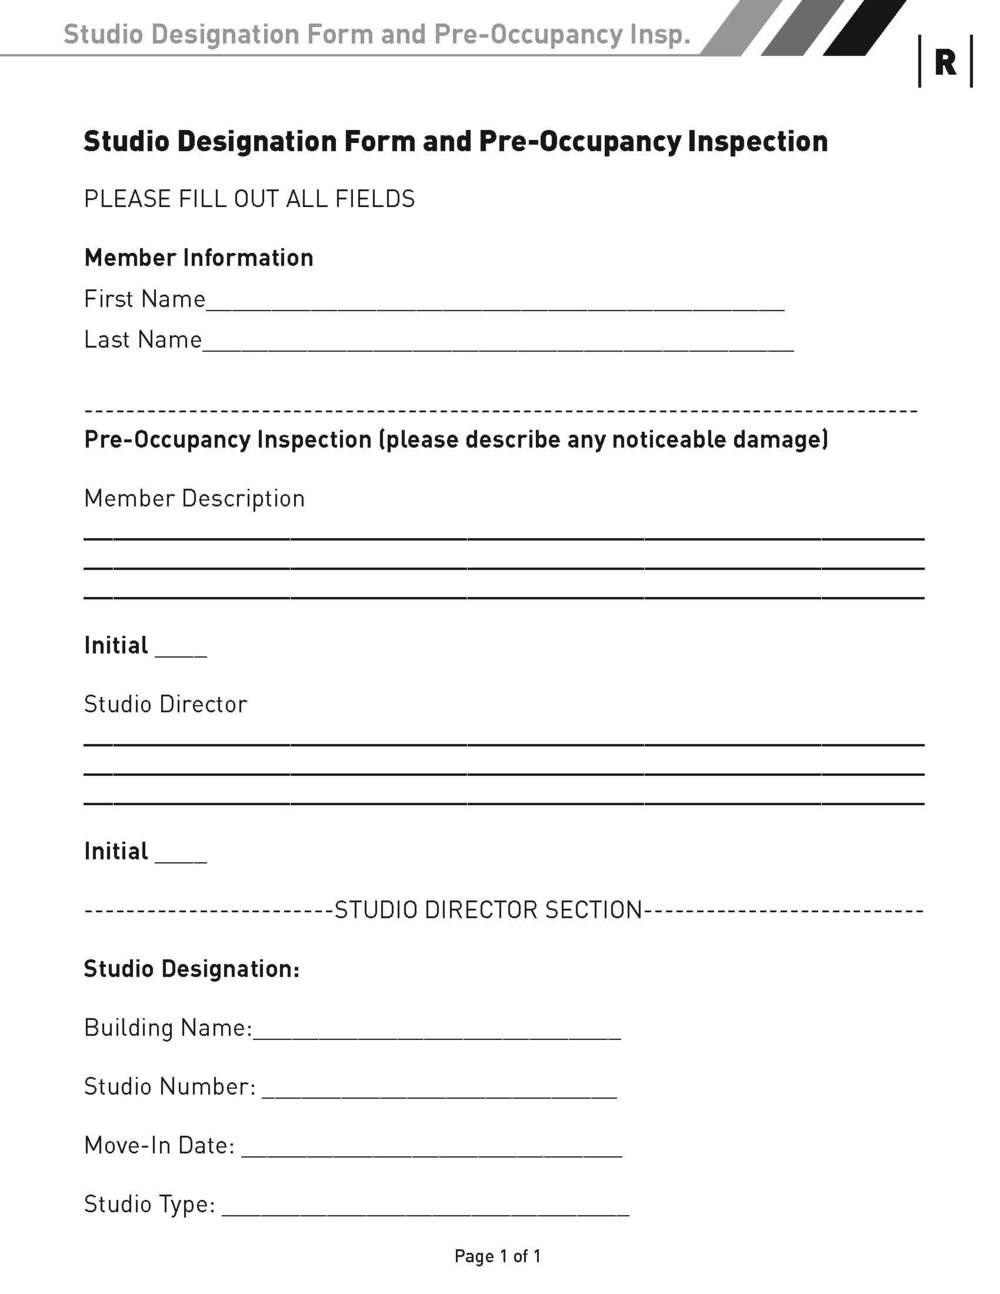 Studio Designation Form and Pre-Occupancy Inspection